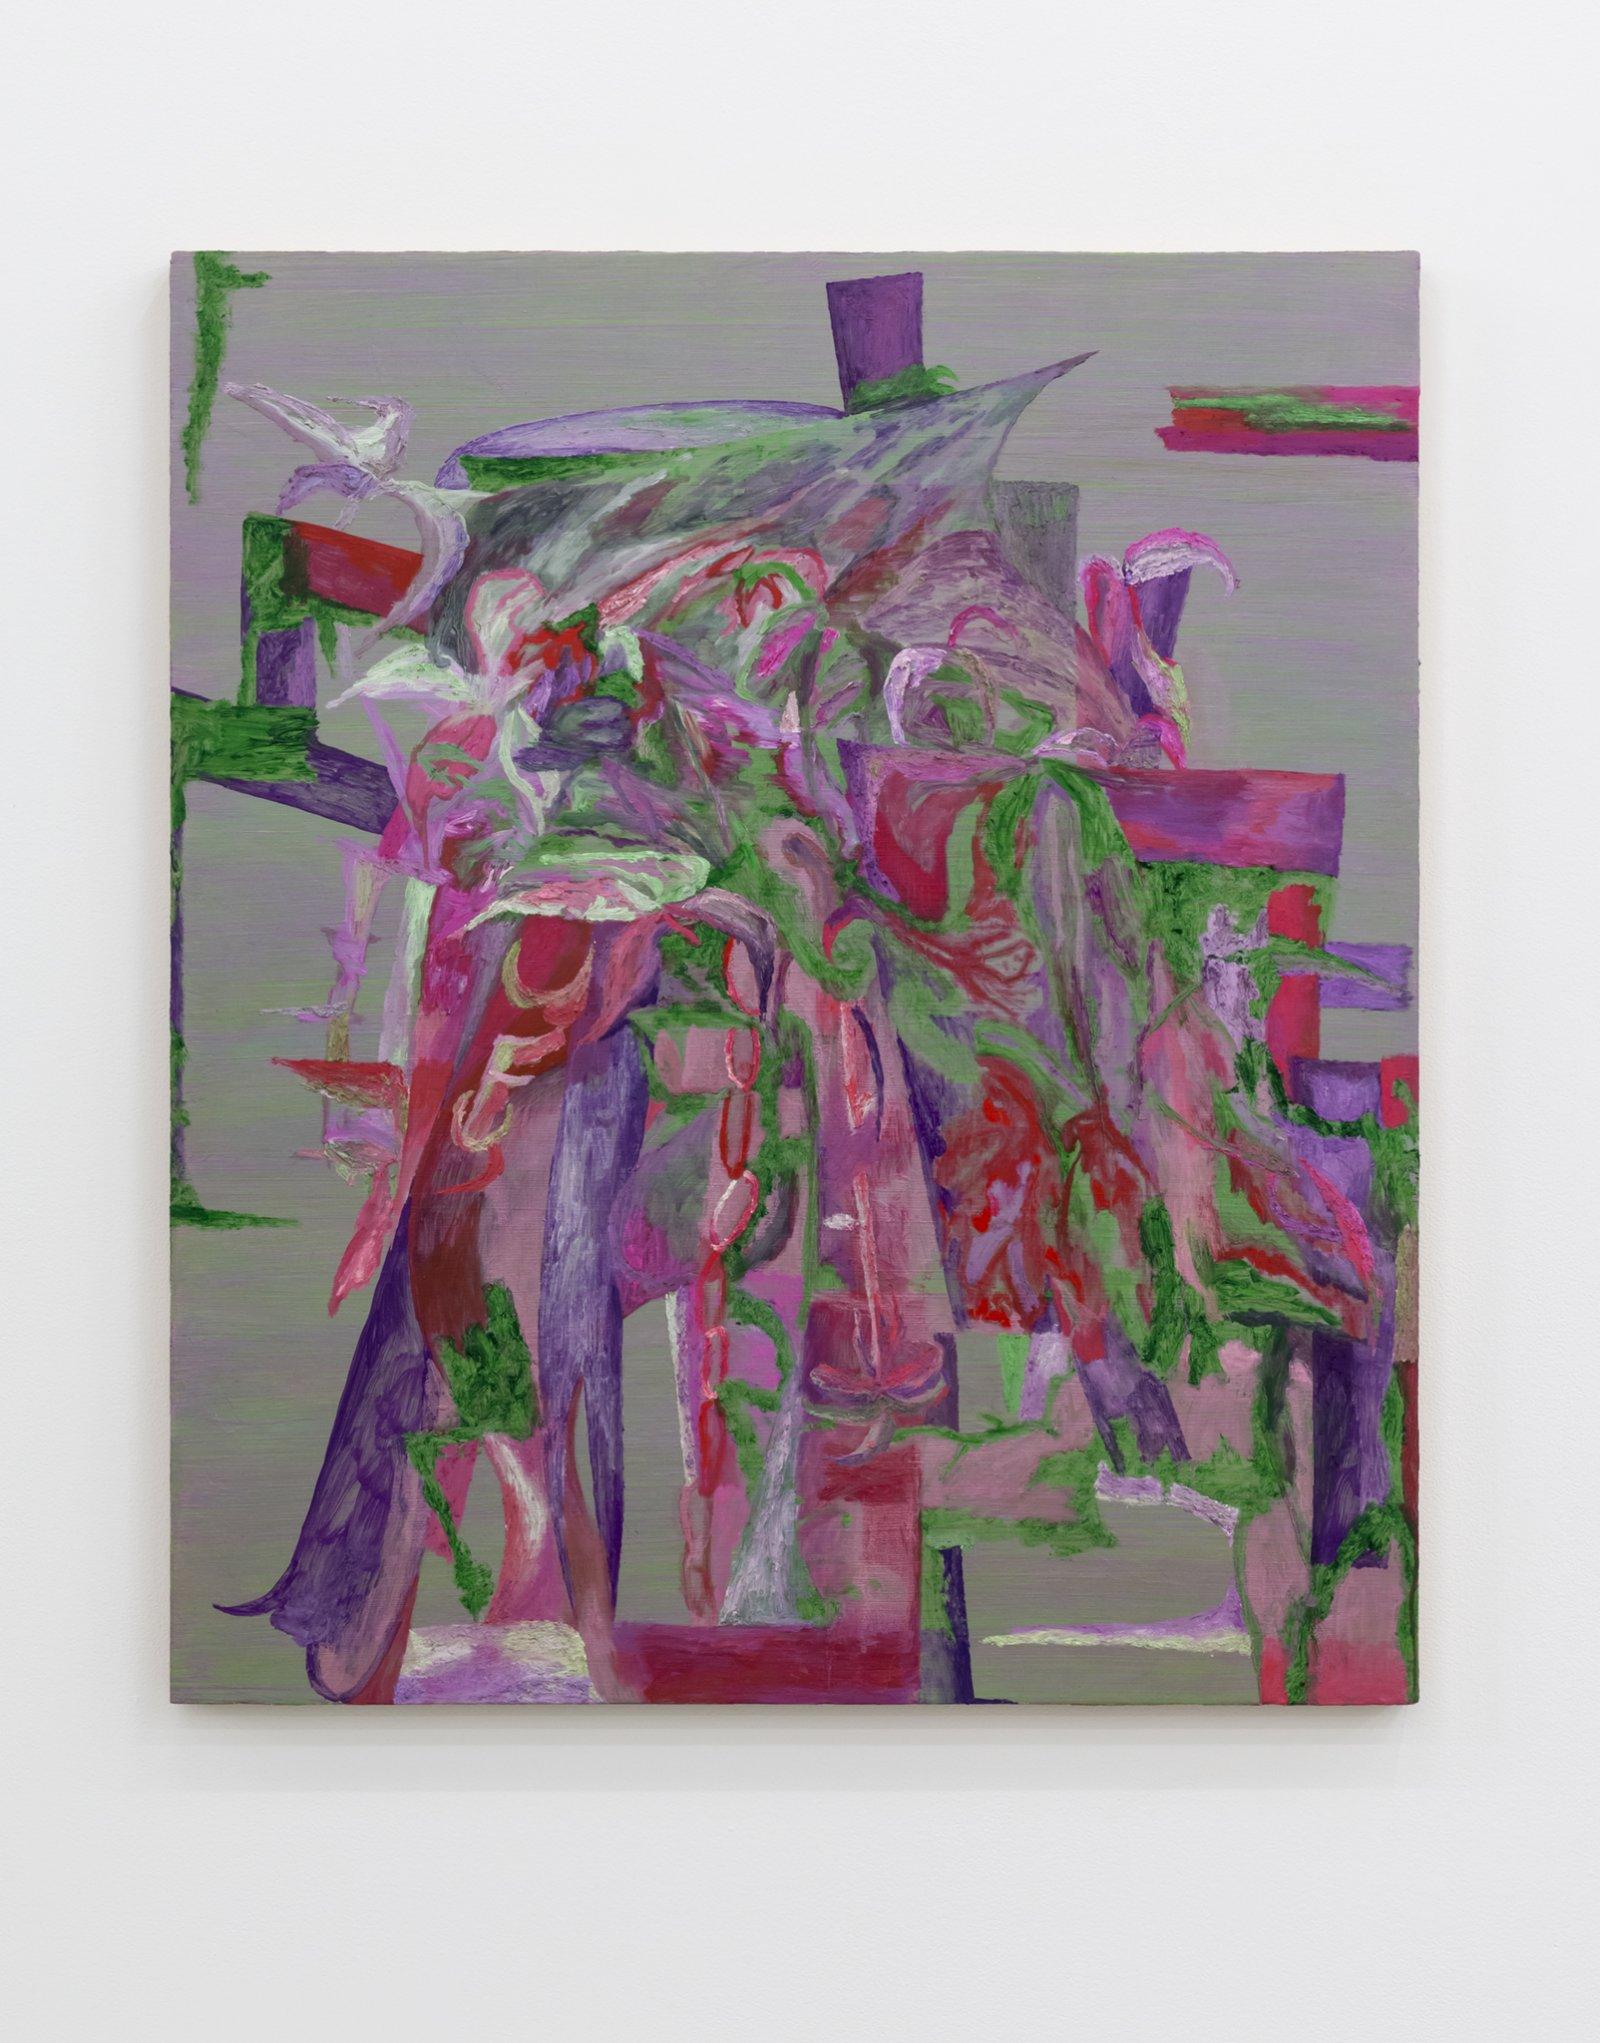 Rebecca Brewer,Flower Dumpster, 2018, oil on panel, 42 x 36 in. (107 x 92 cm)